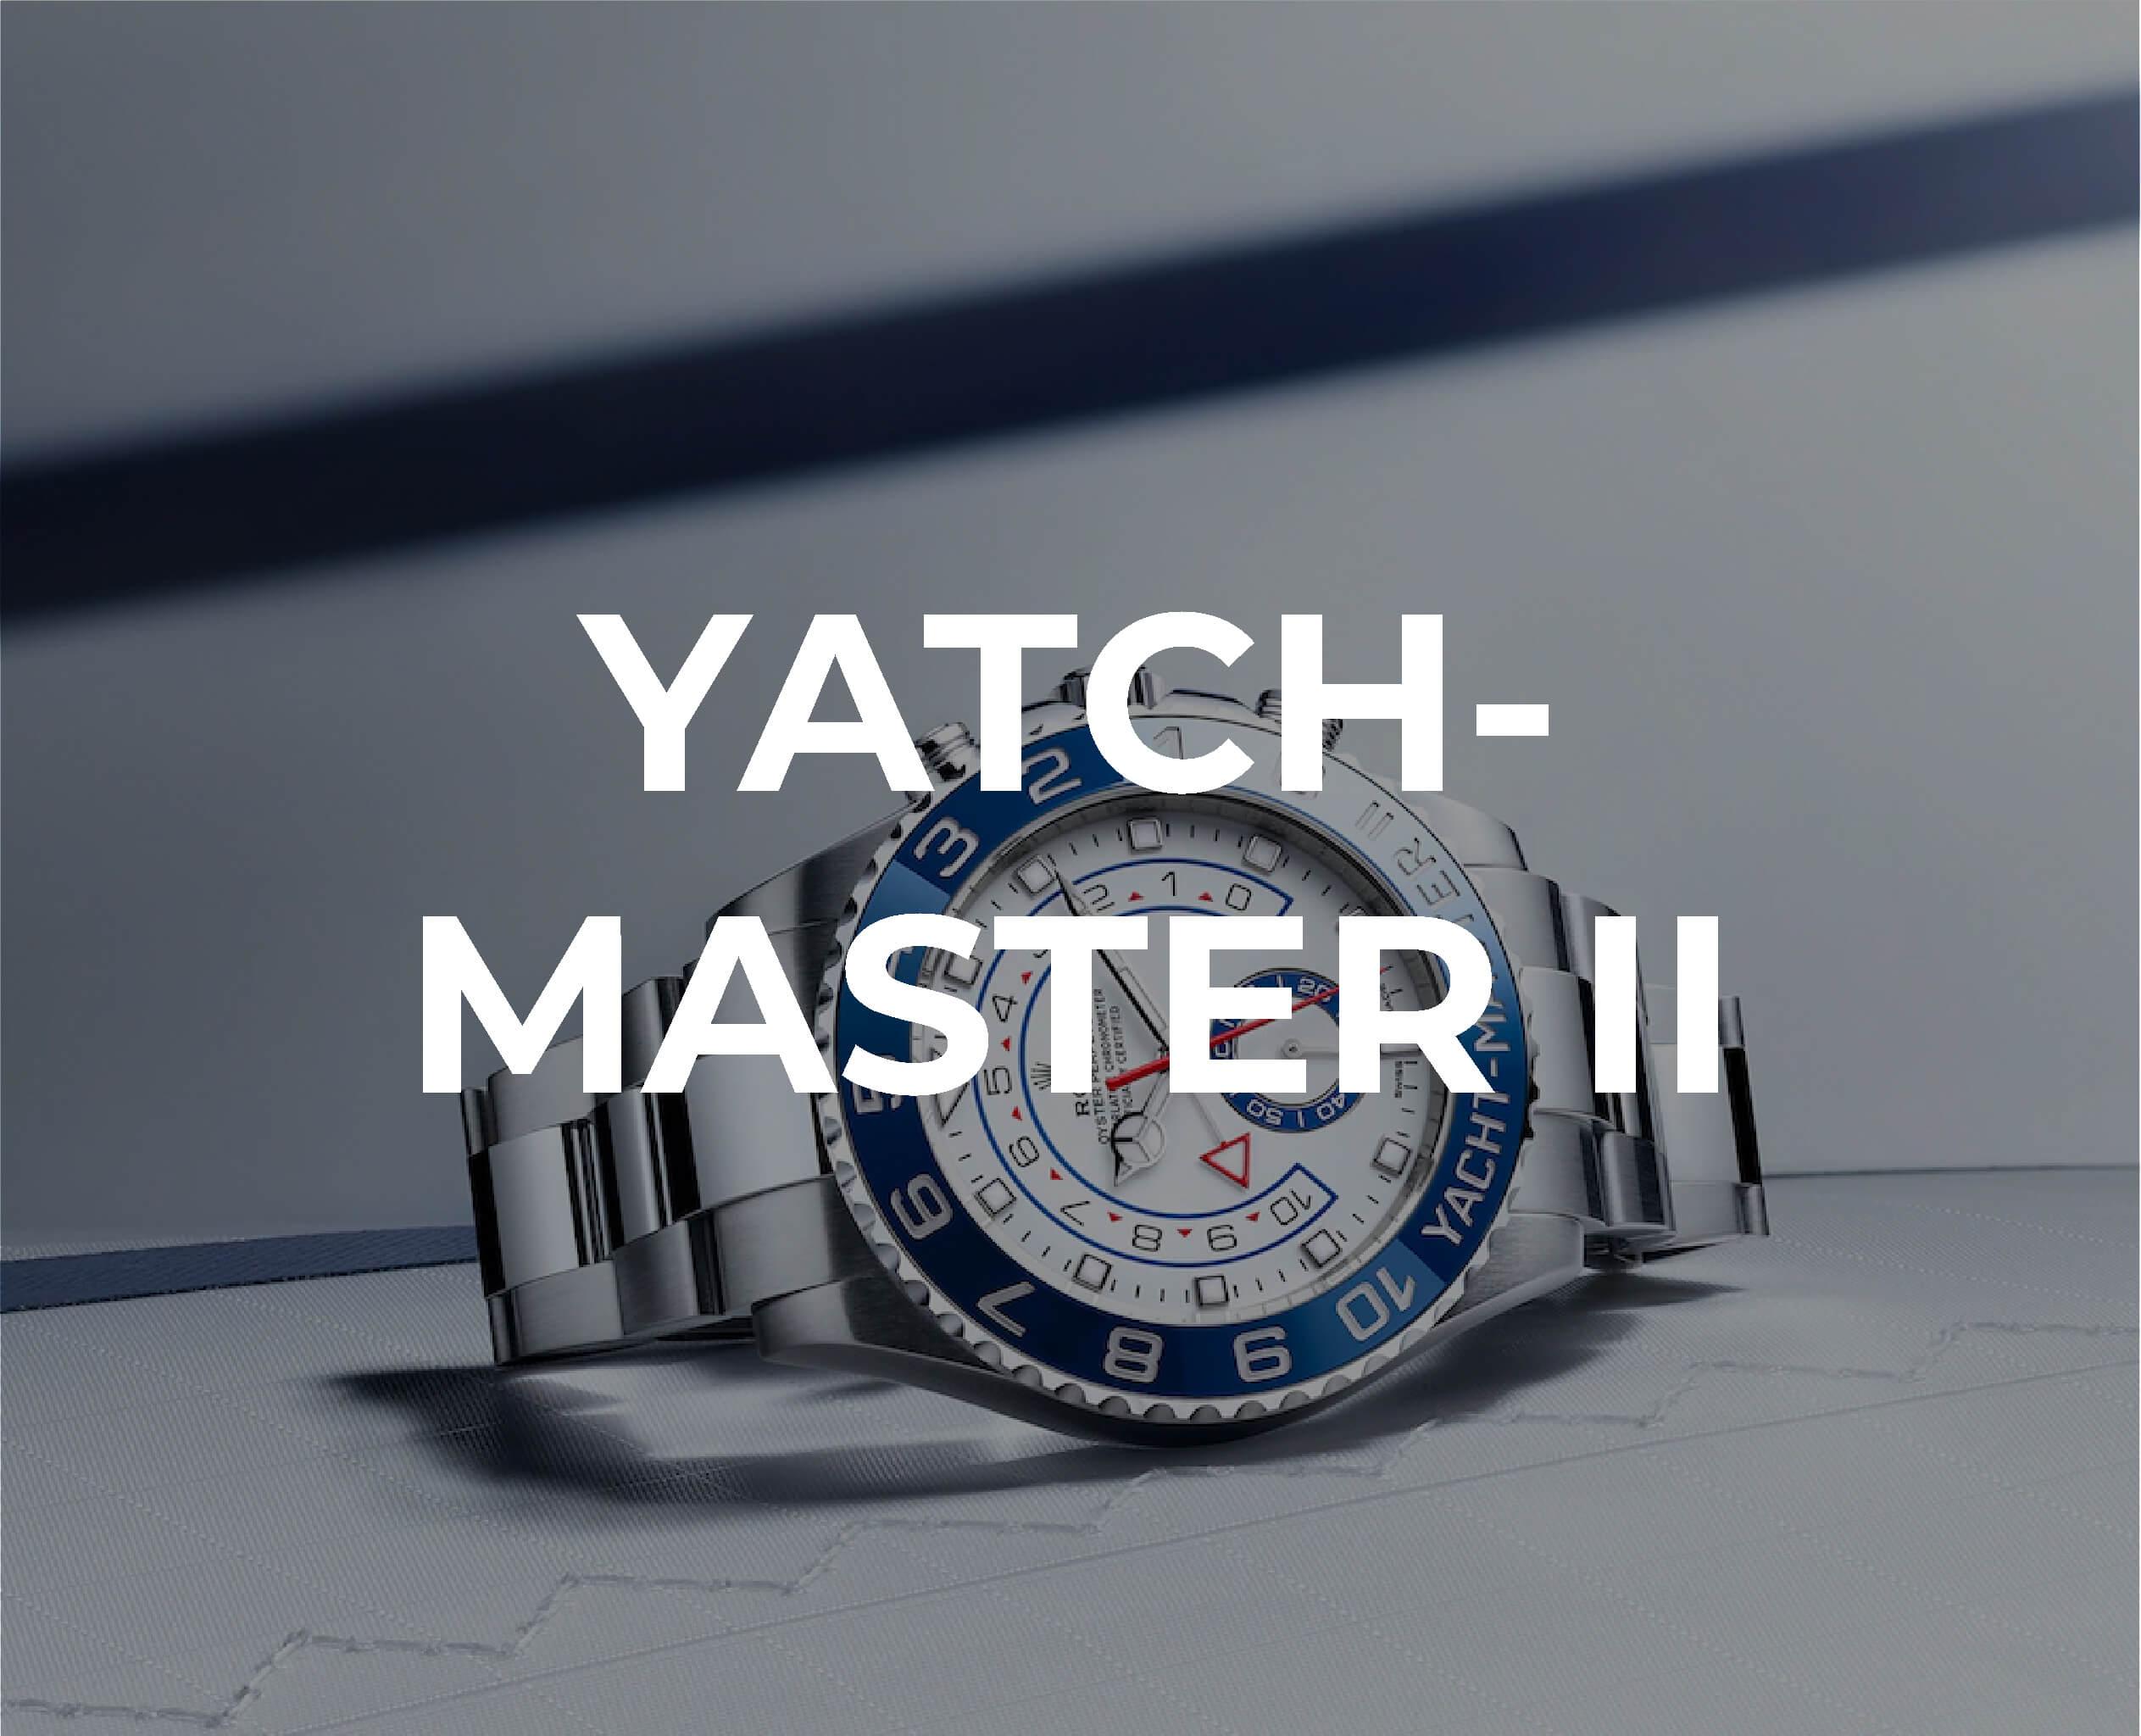 Rolex Yatch-Master II Collection